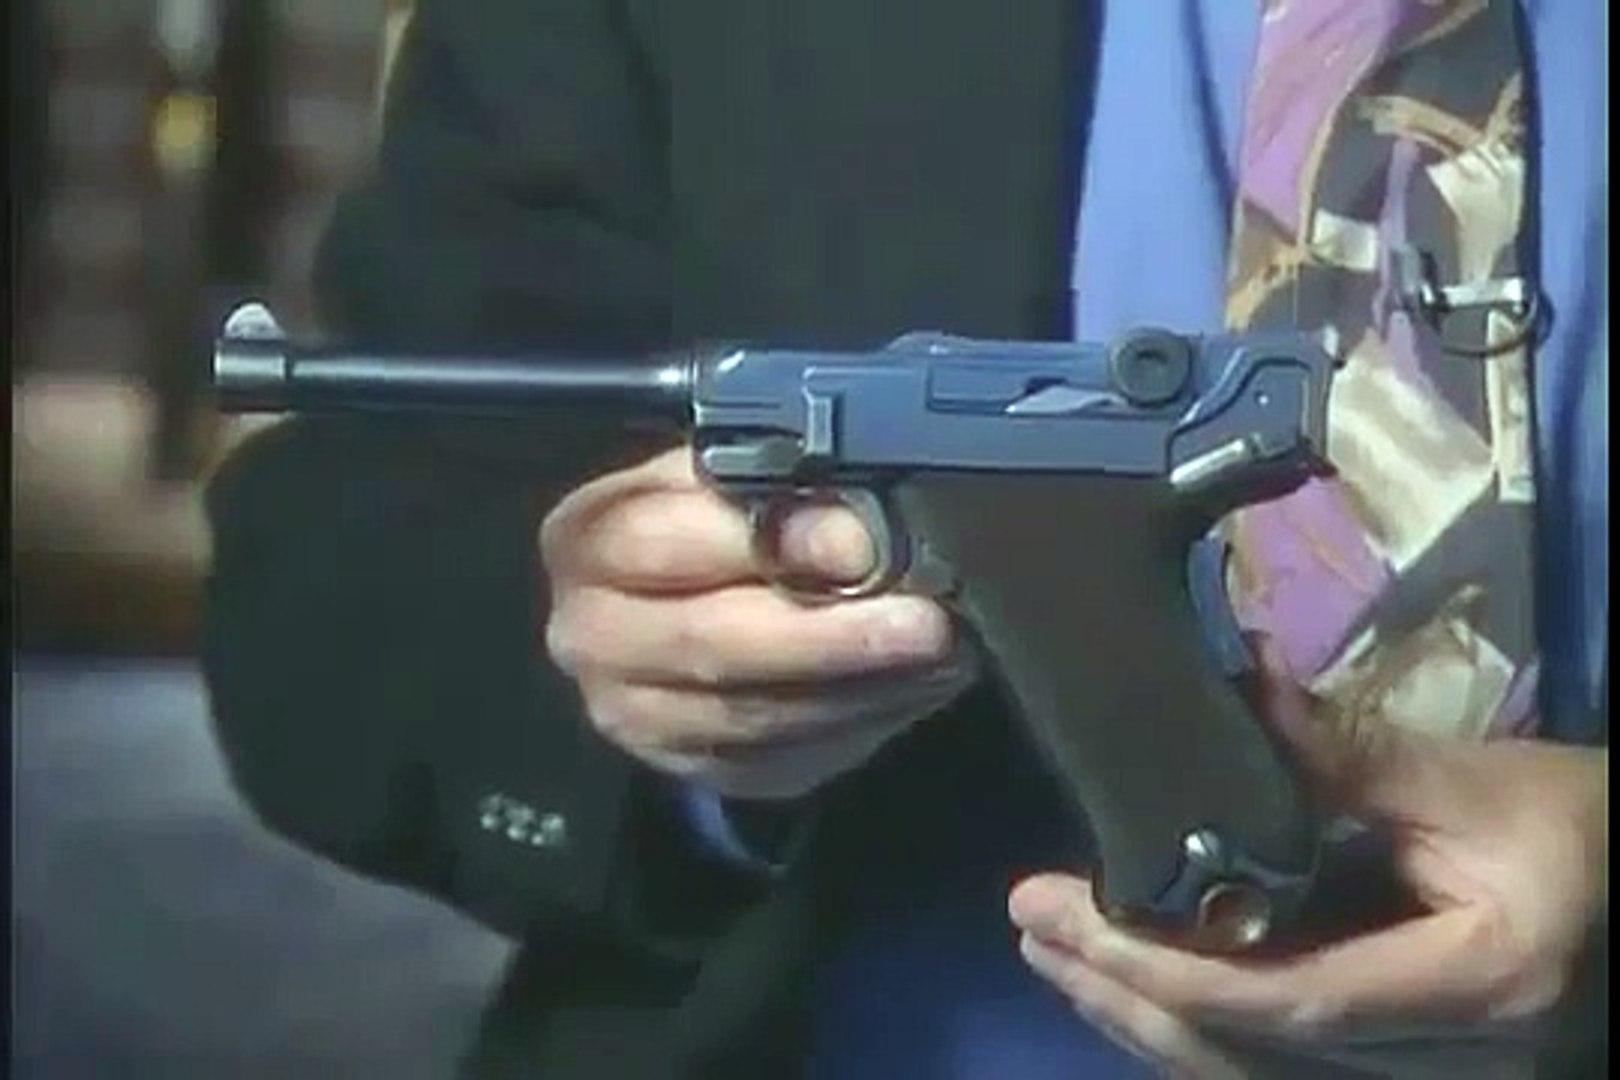 TALES OF THE GUN - MILLION DOLLAR GUNS - Discovery History Military (full documentary)